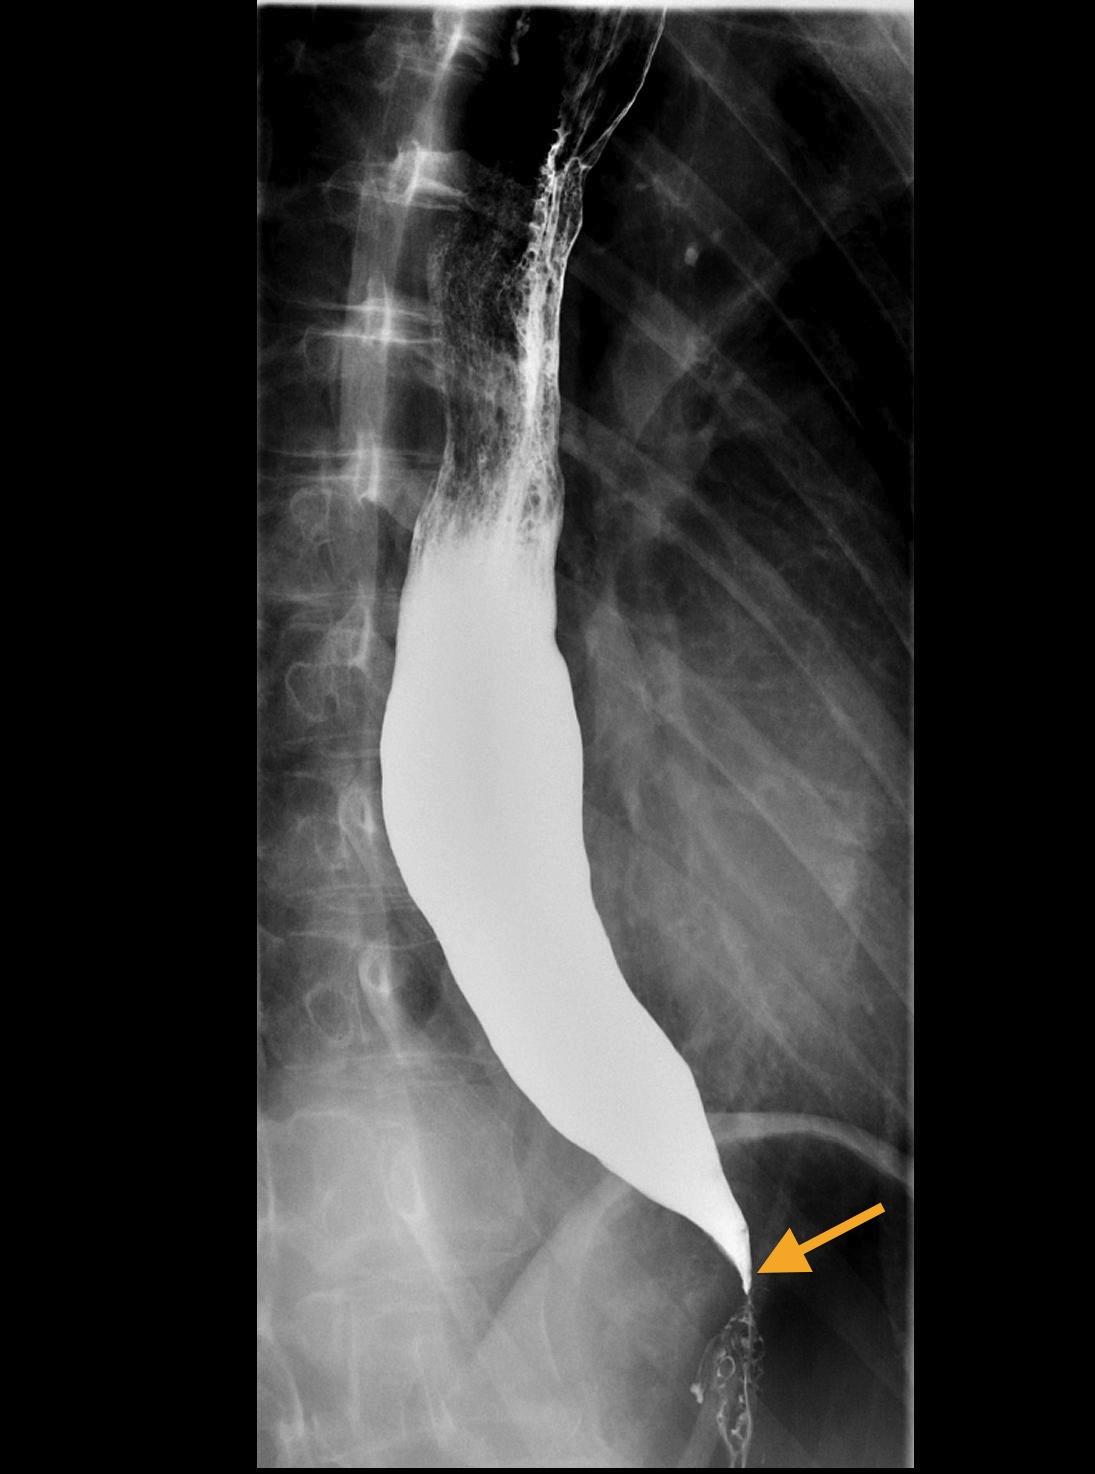 Upper GI Series Test (Barium Swallow): Procedure, Side Effects